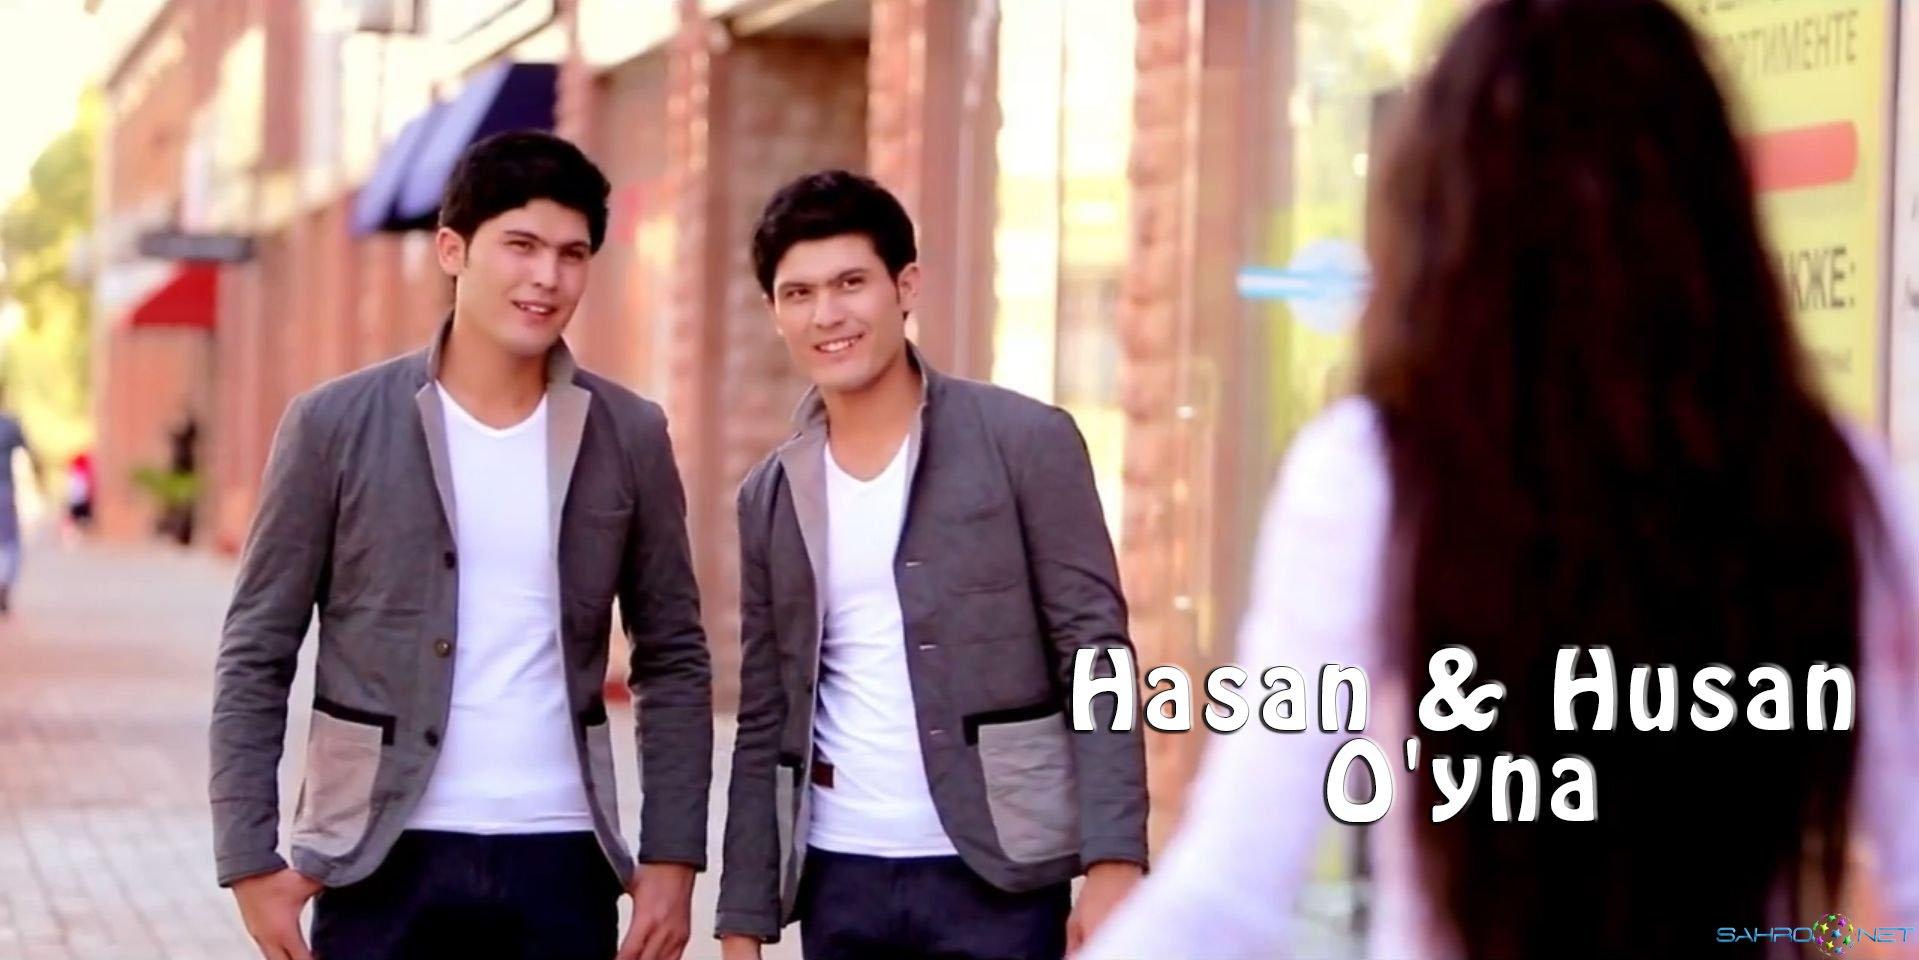 Hasan & Husan - O'yna Yangi U`zbek Klip 2015